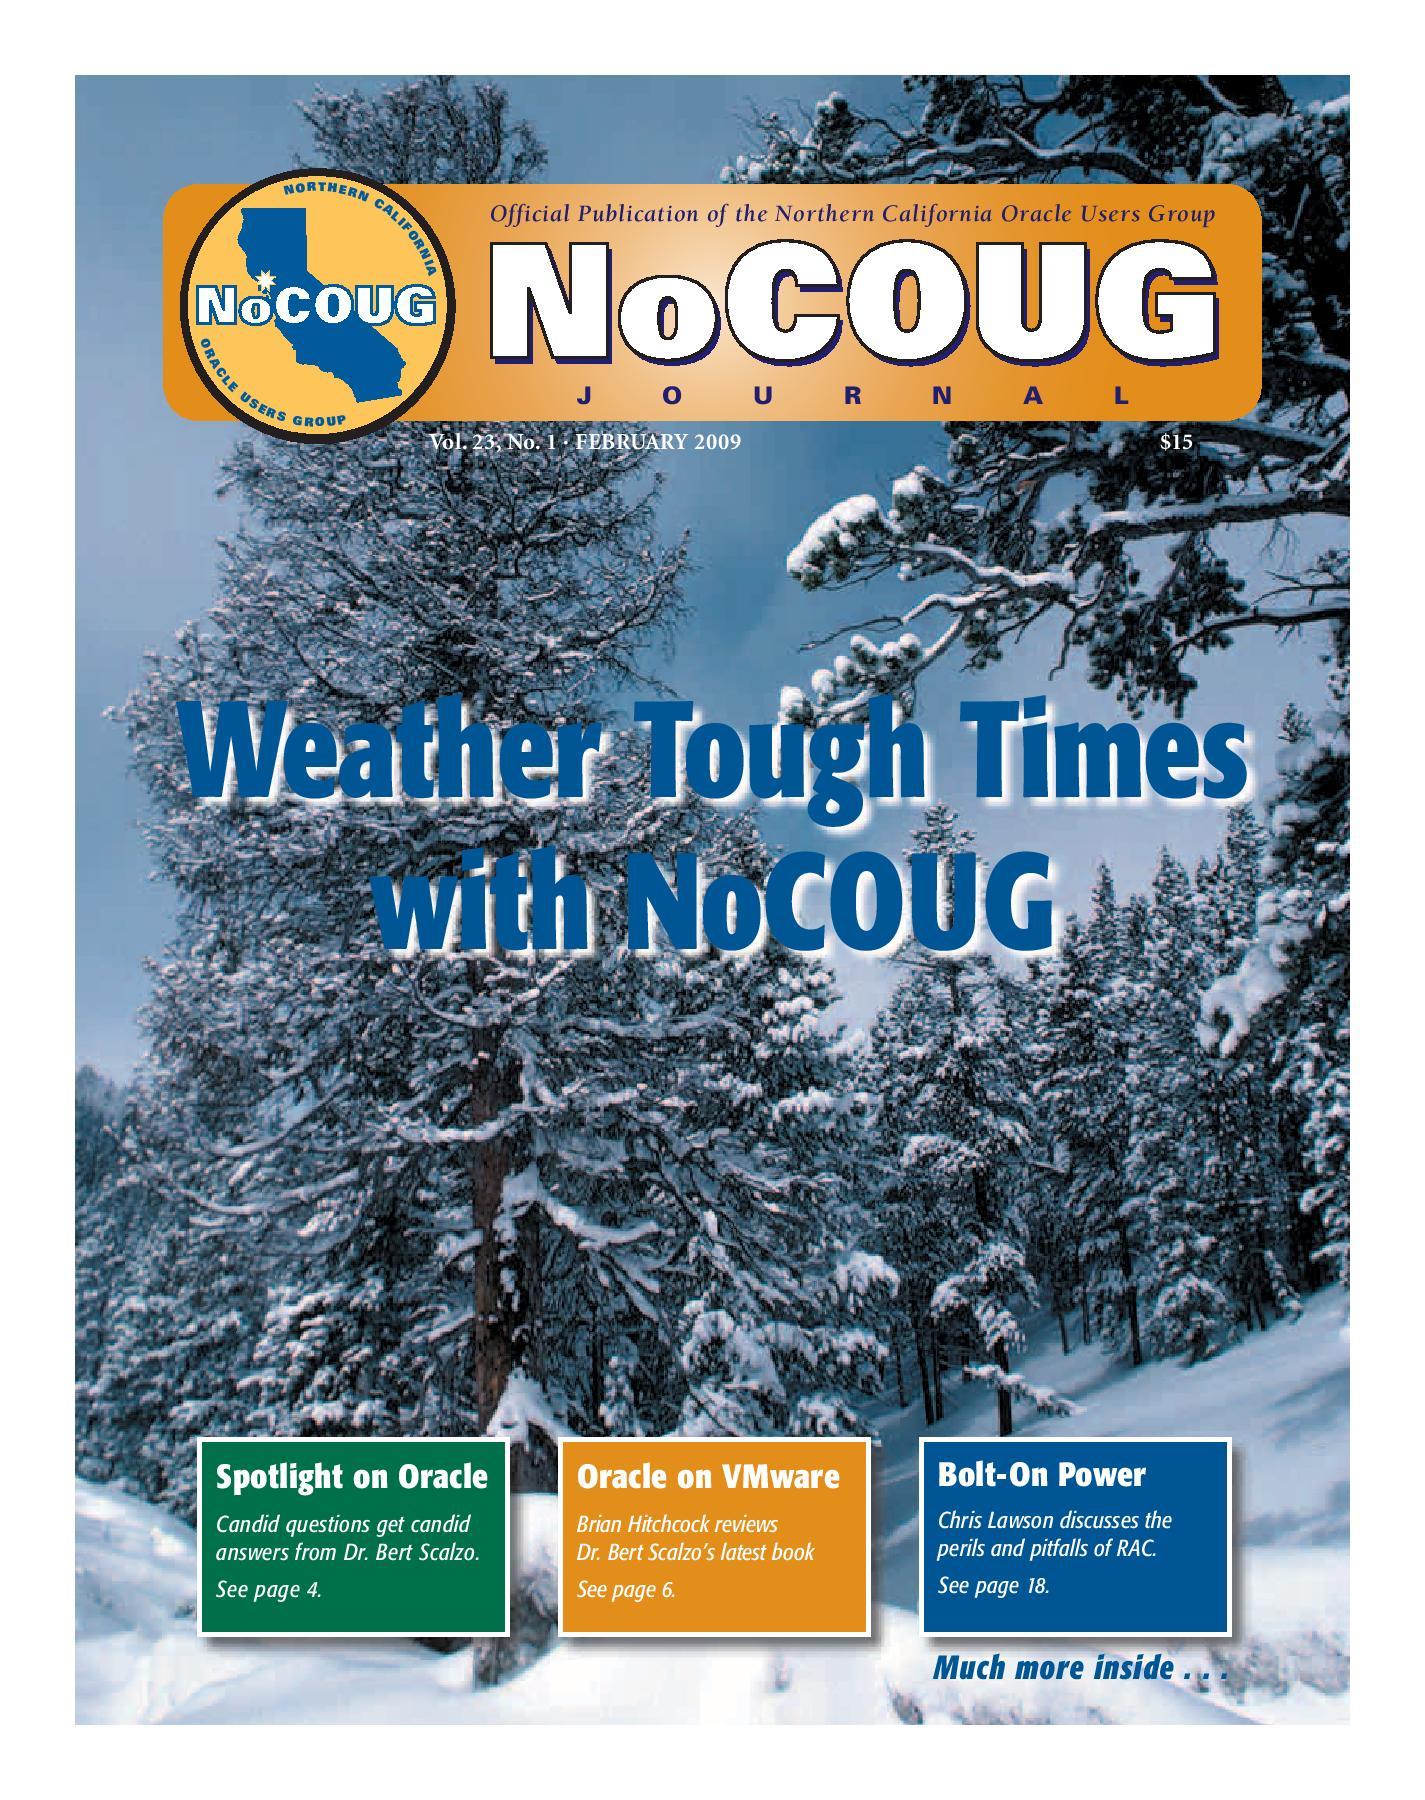 NoCOUG Journal 2009 02